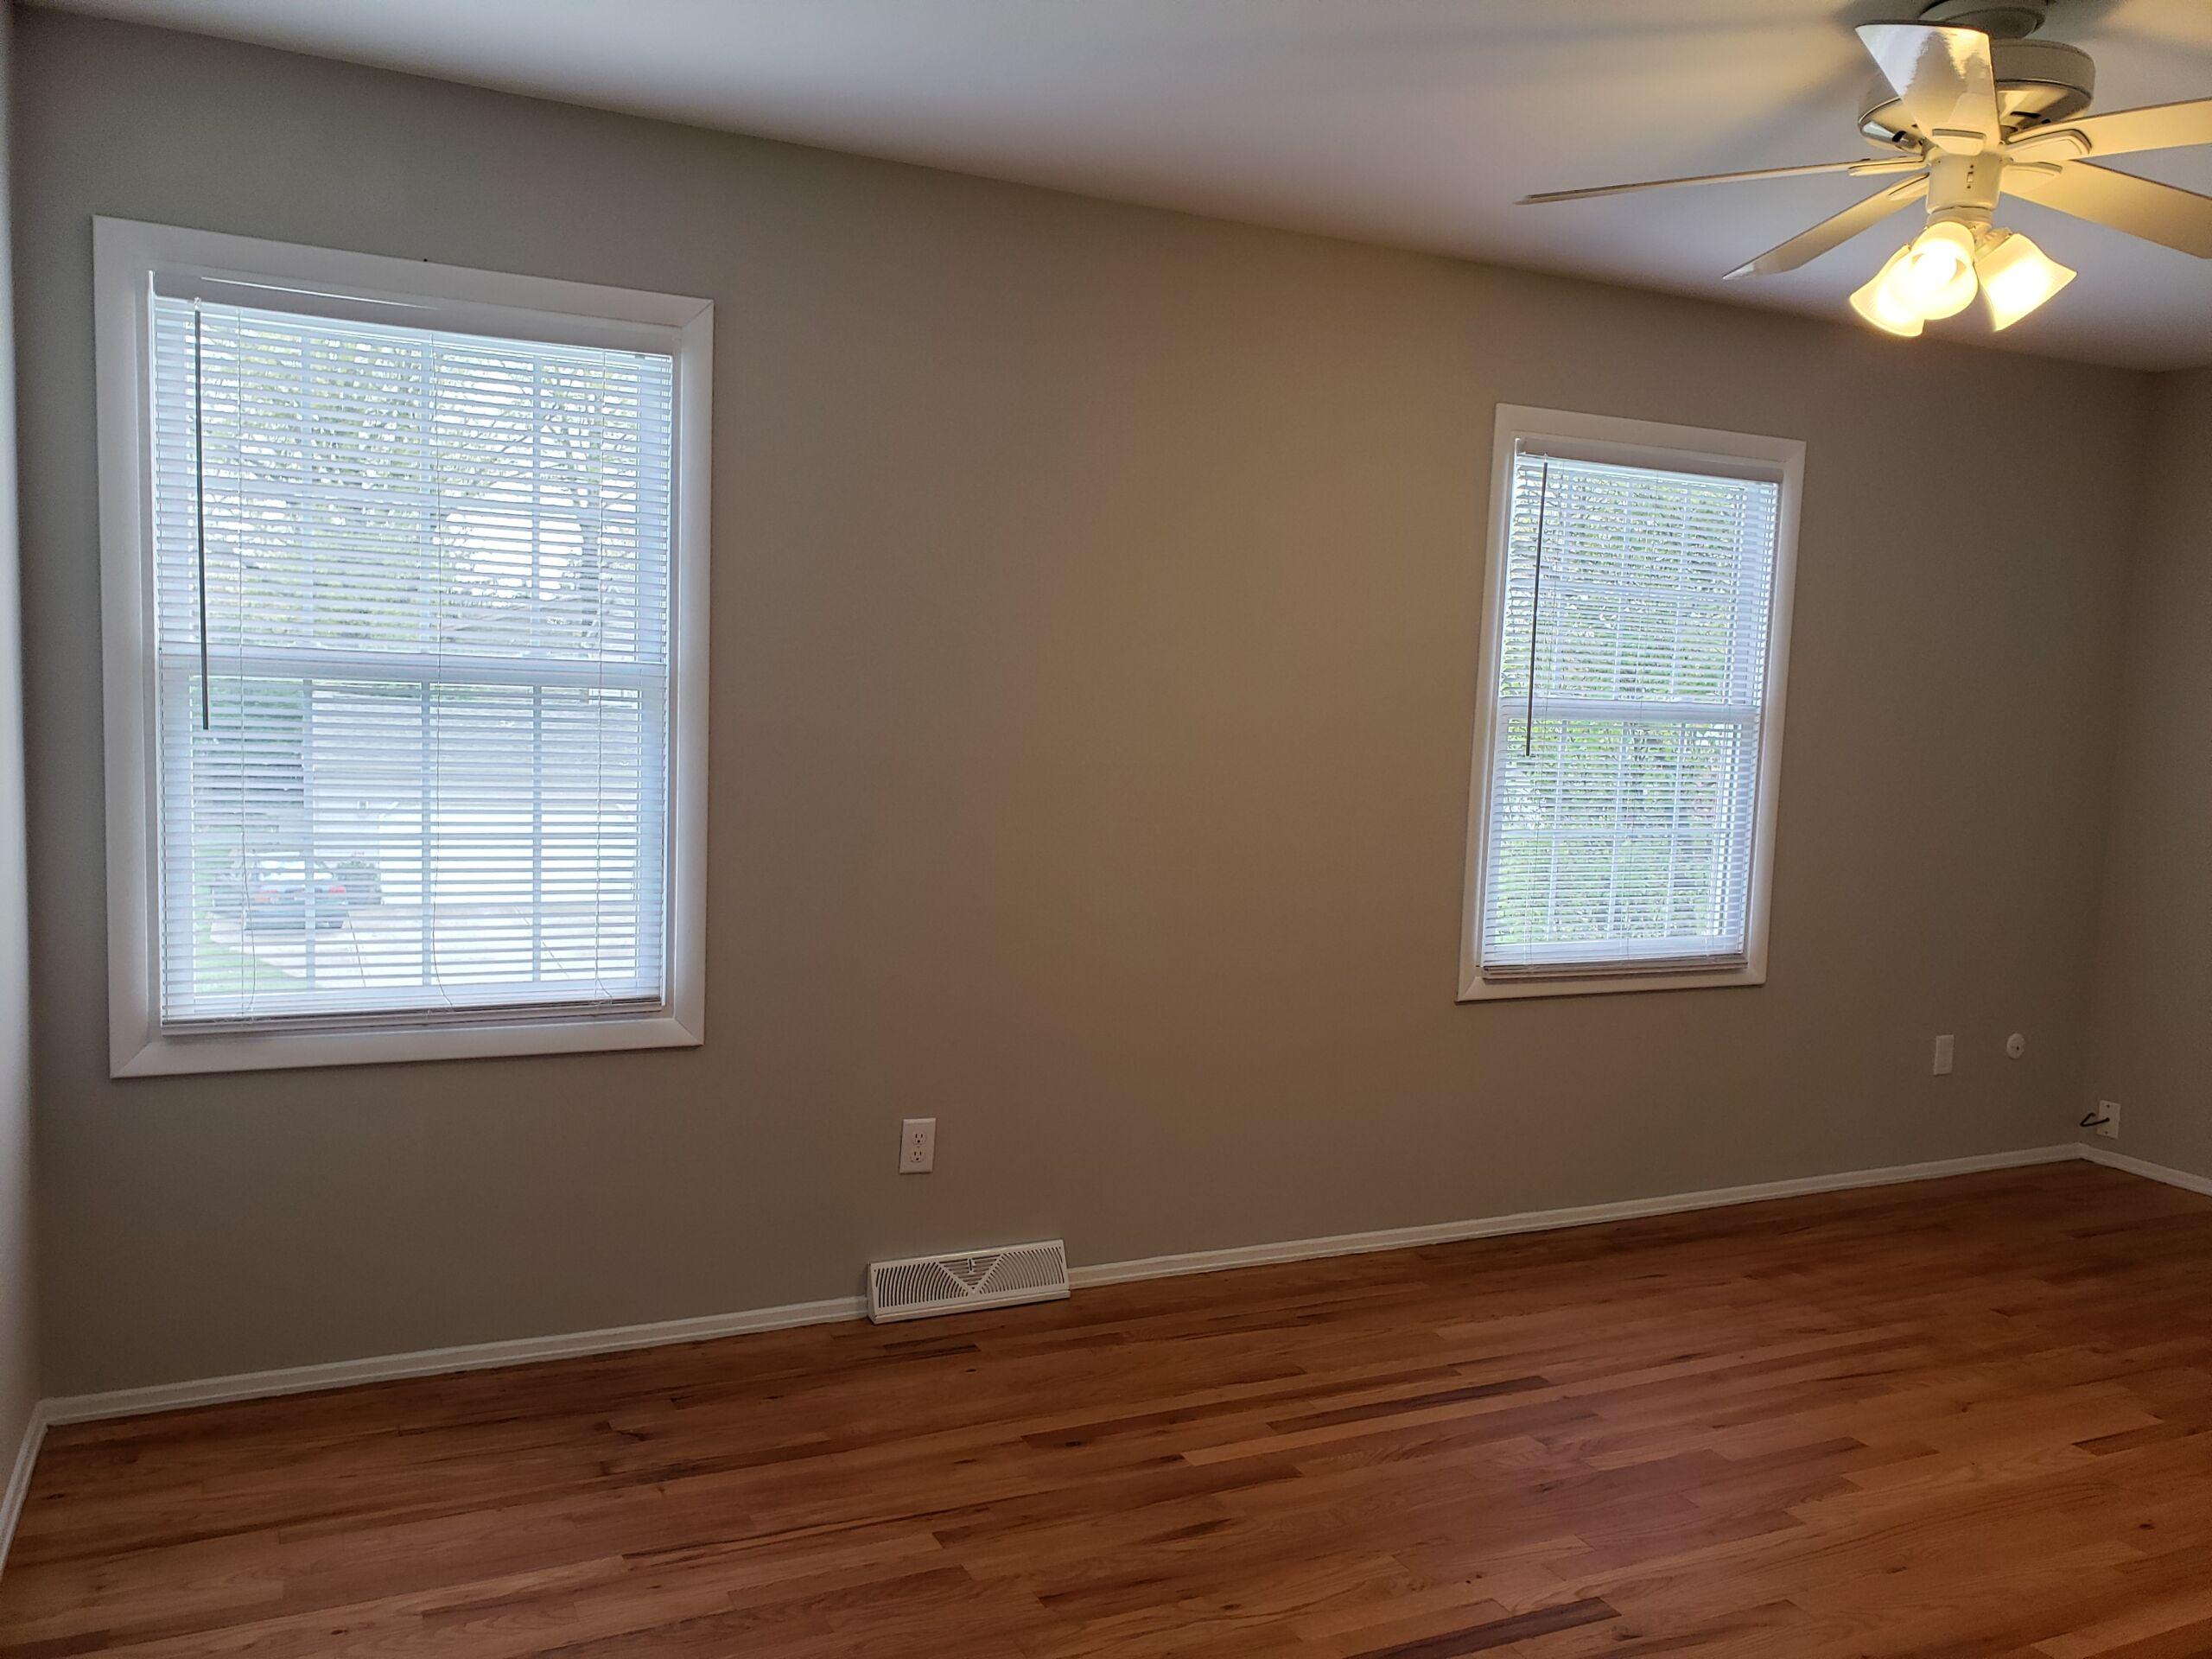 Beautifully Updated, Spacious Home in Reynoldsburg